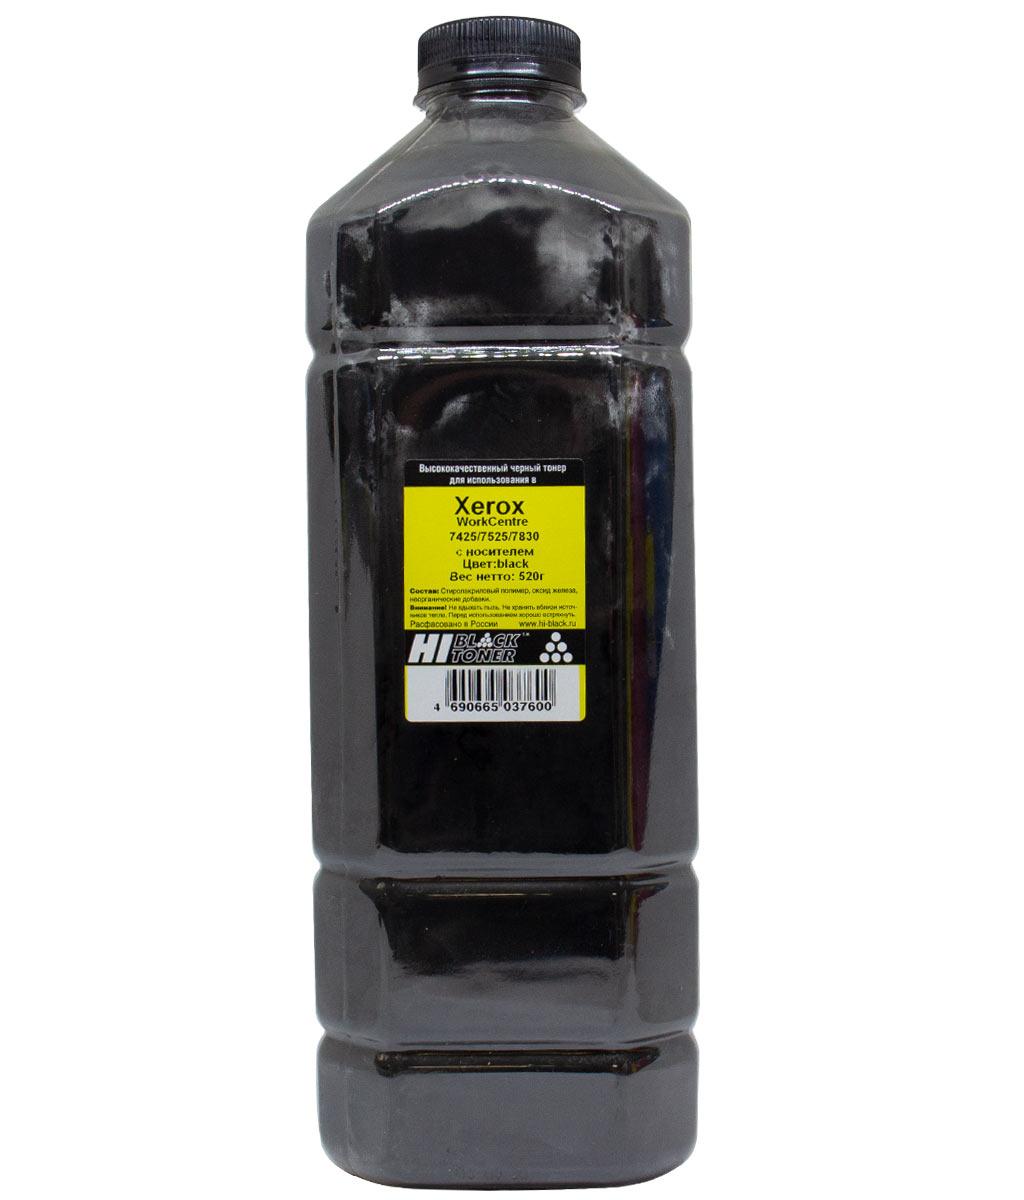 Тонер Hi-Black с носителем для Xerox WorkCentre 7425/7525/7830, Bk, 520 г, канистра